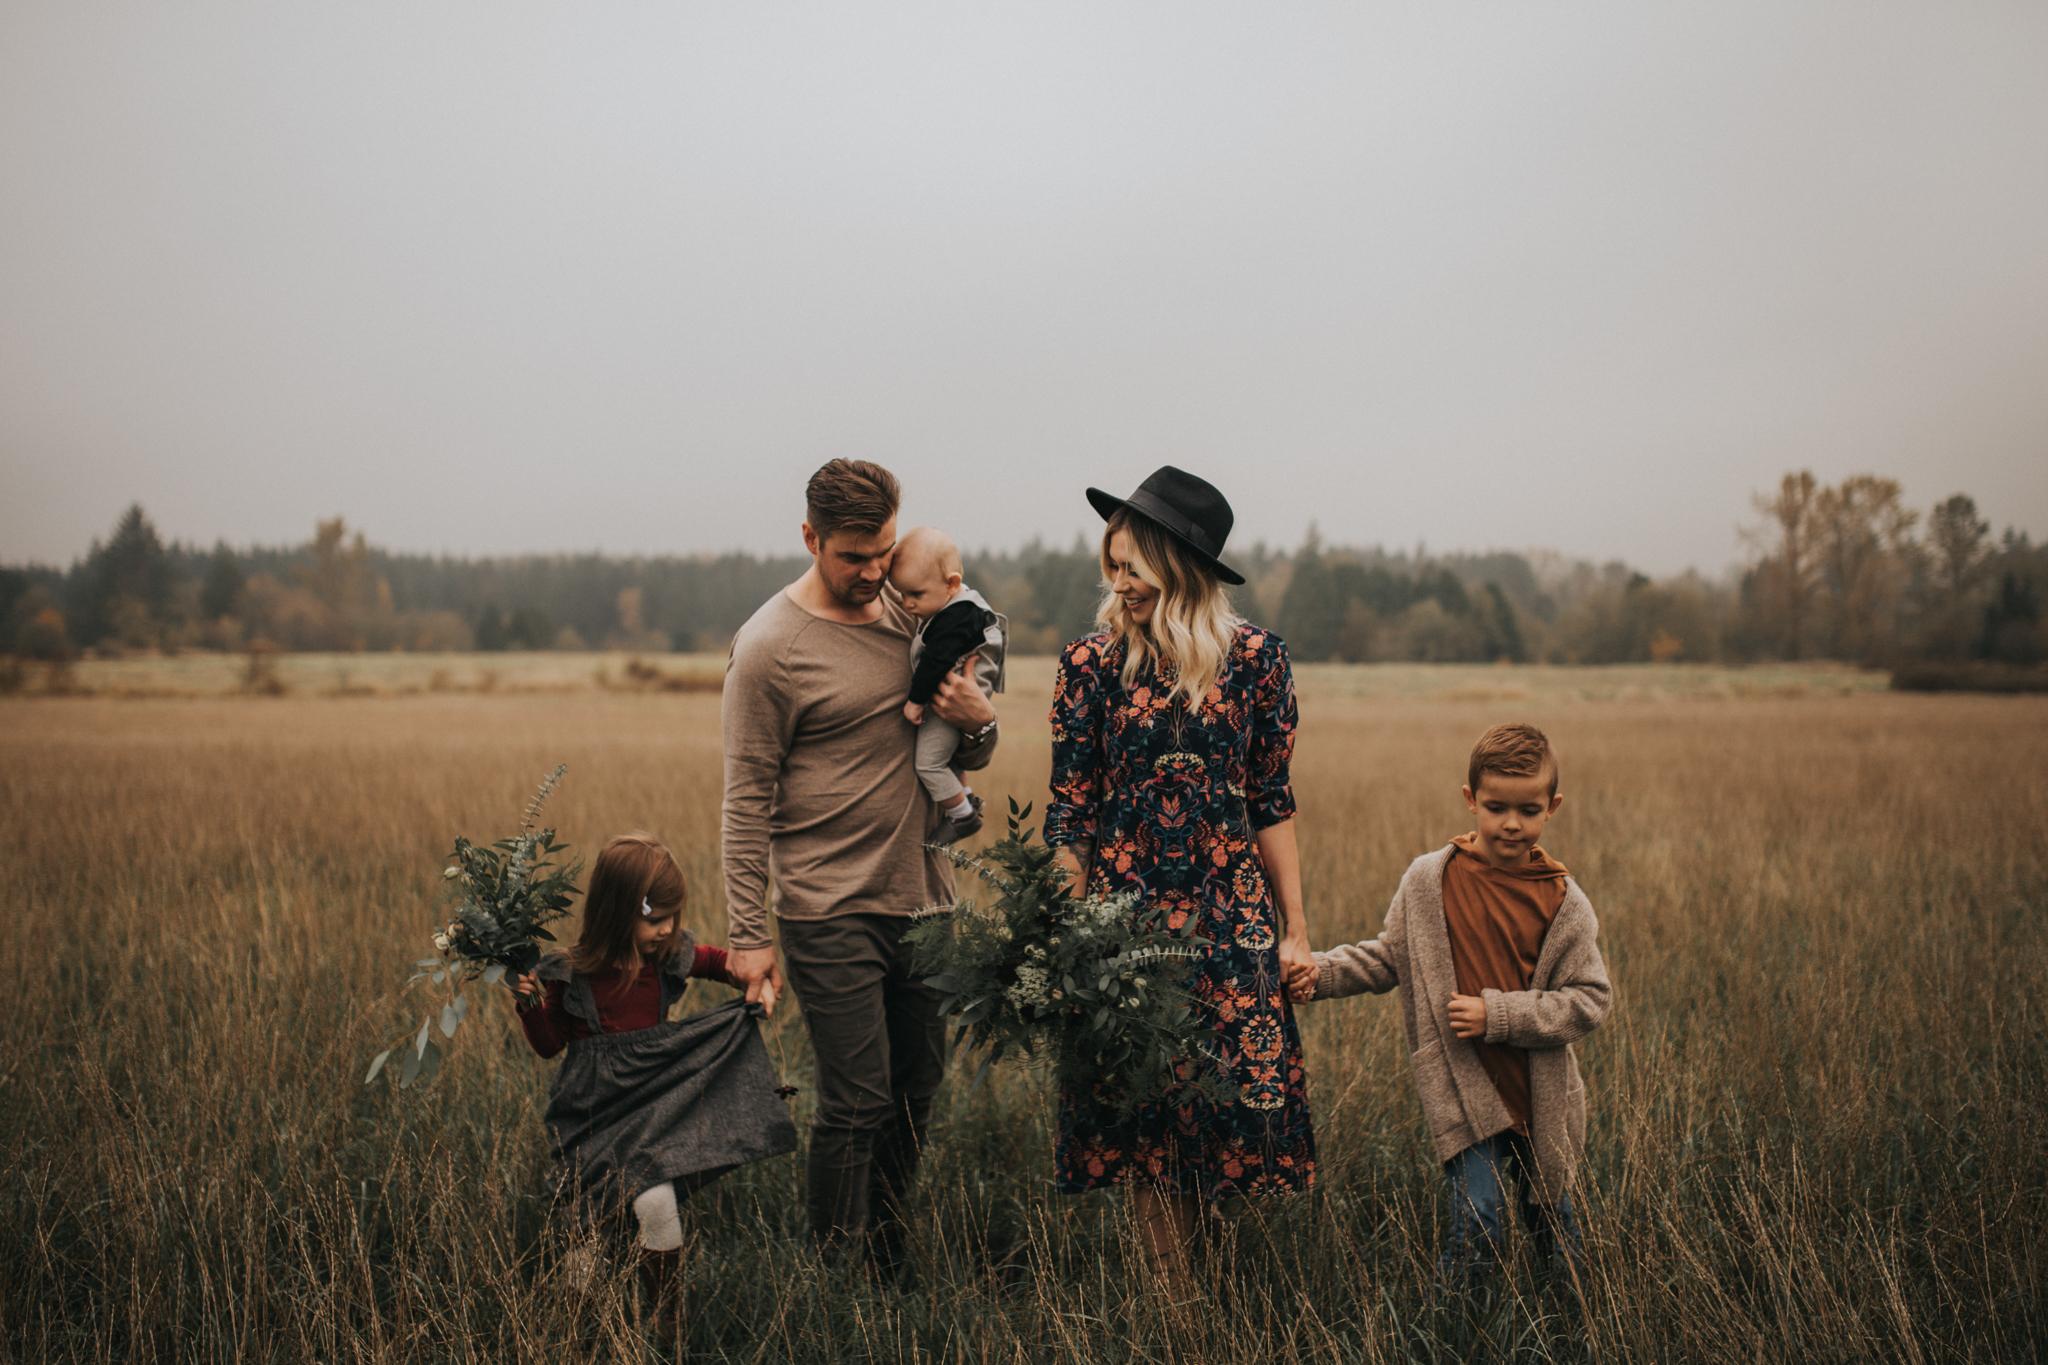 langley_family_photographer_boho_campbell_valley_park_06.JPG